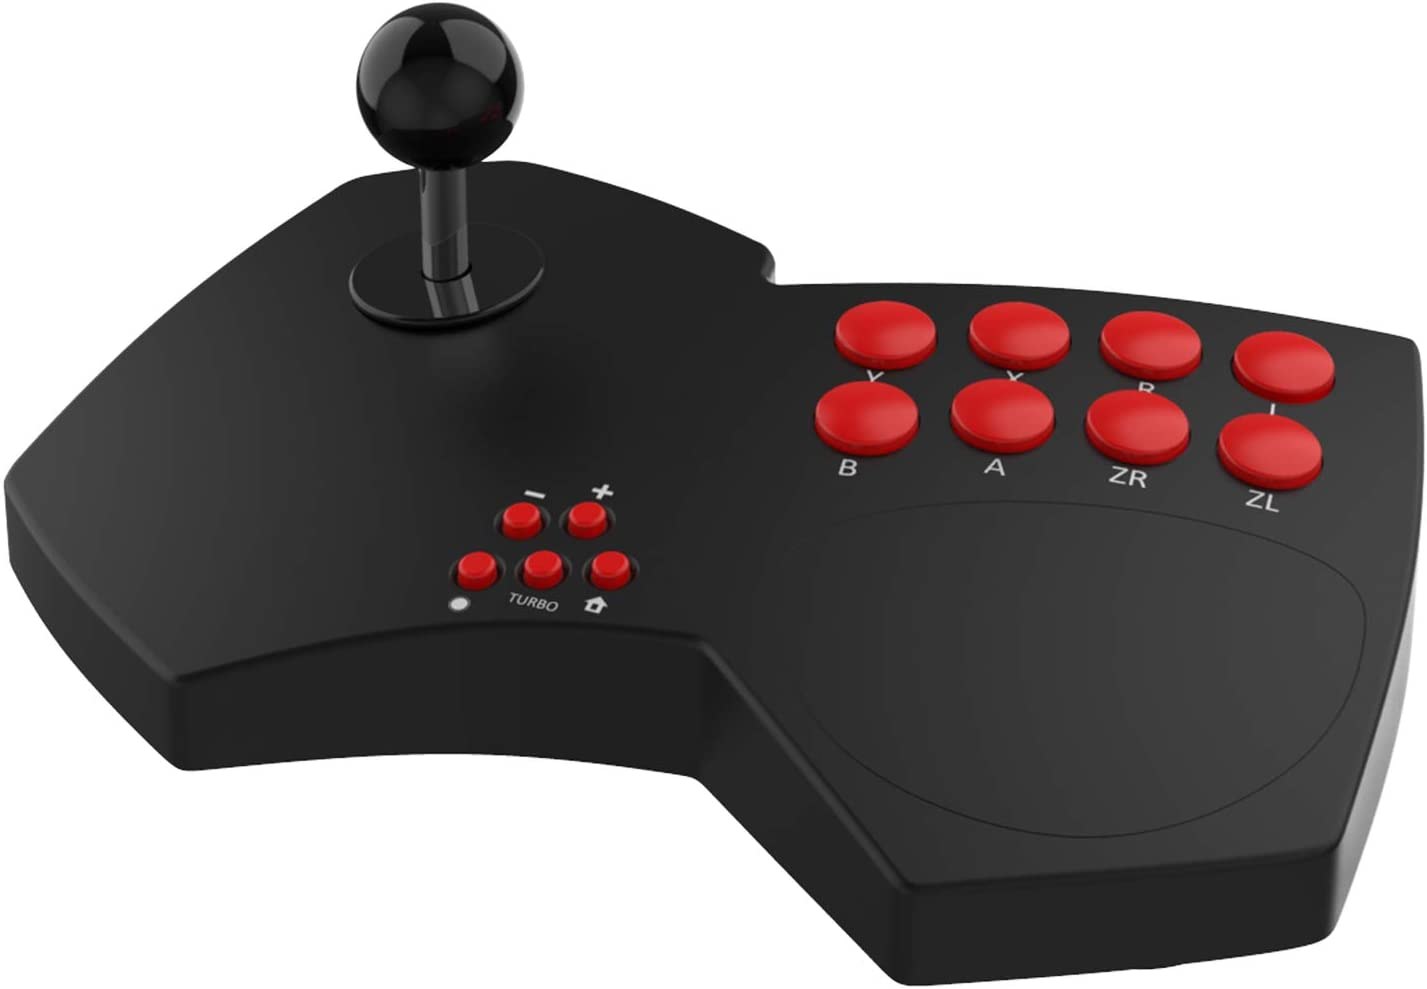 DOYO Arcade Fight Stick,Game Arcade Joystick Multi-Function Joystick for Switch/PC Xinput/PC DirectInput/PS3/TV Android/Raspberry Pi/NeoGeo… (Black-2): Computers & Accessories